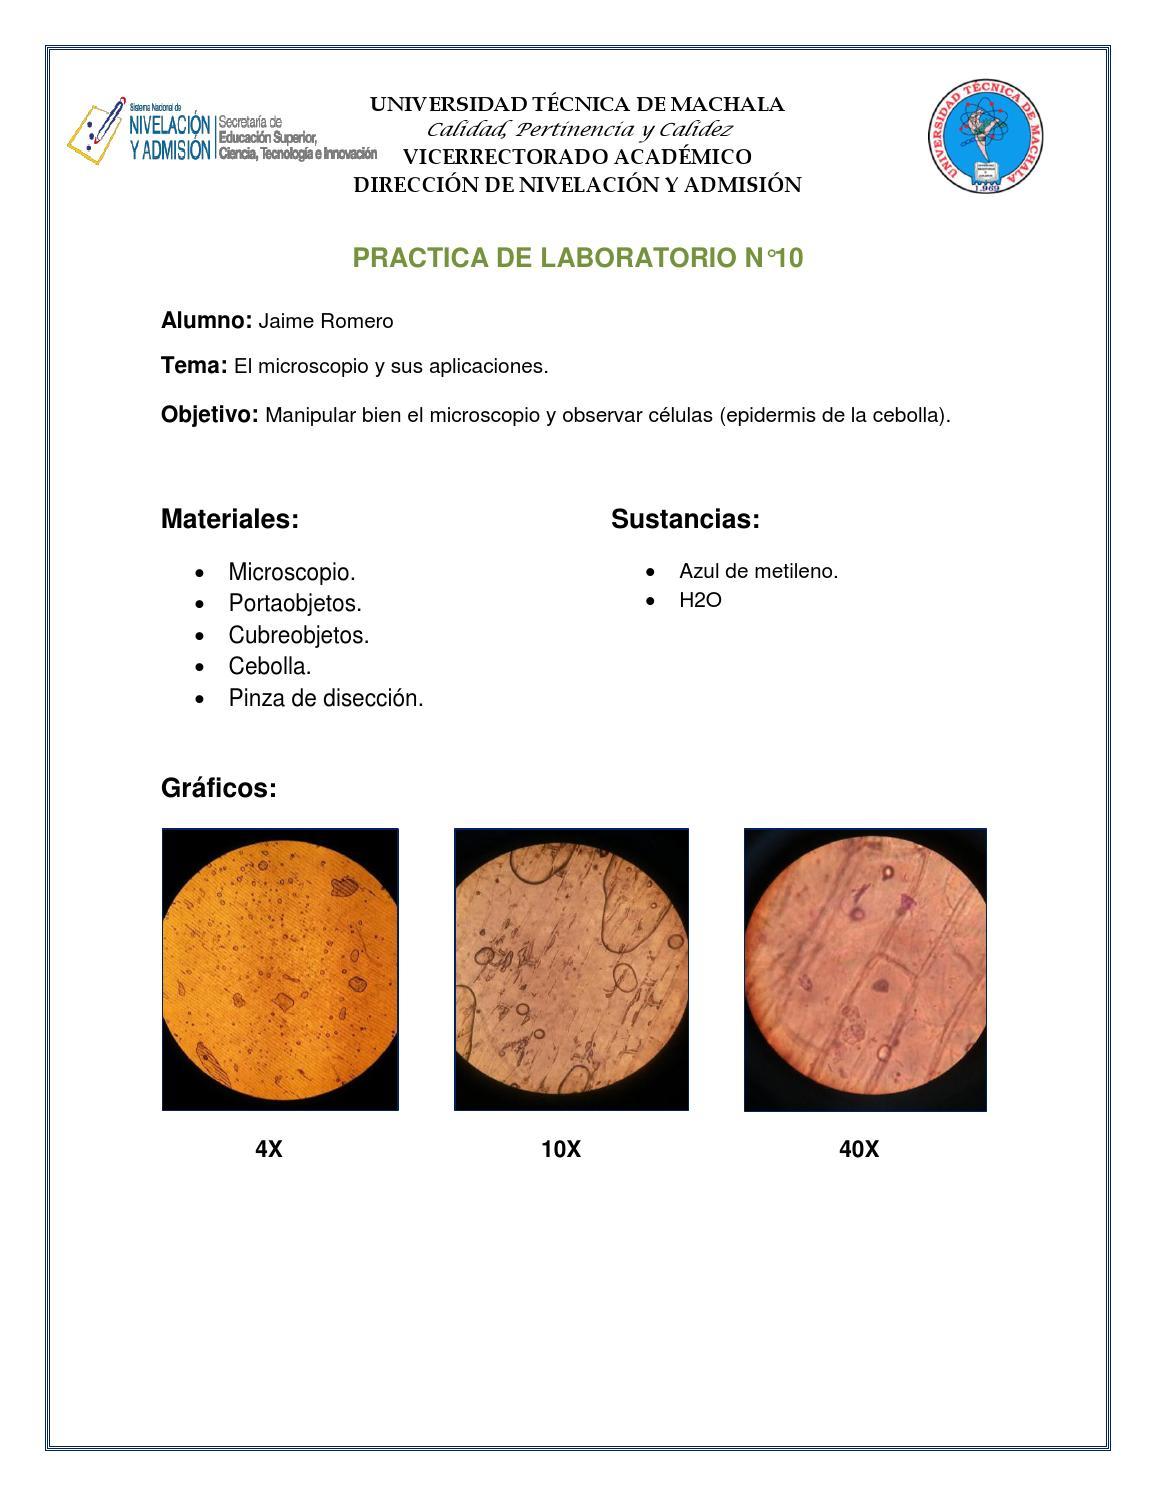 Practica De Laboratorio Cebolla By Un Tal Jaime Romero Issuu